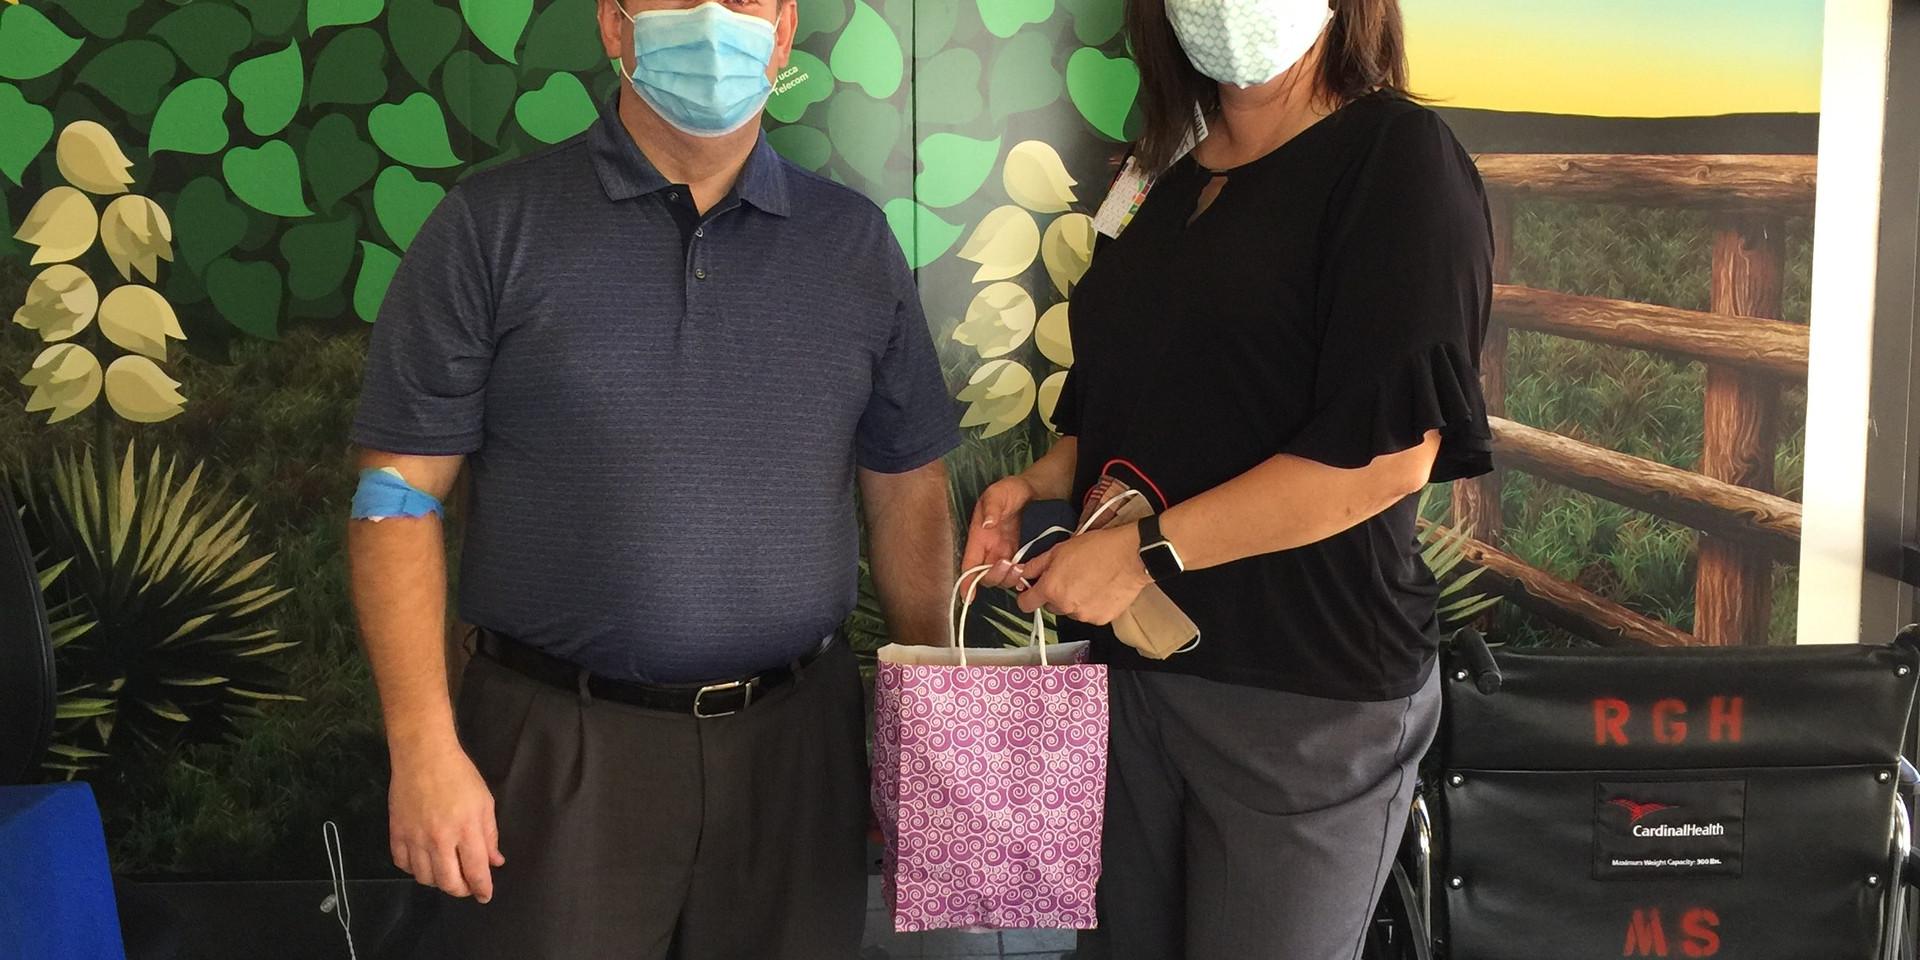 Stephen Stoddard, Executive Director of NMRHN delivering homemade mask donations to Roosevelt General Hospital on June 30, 2020.